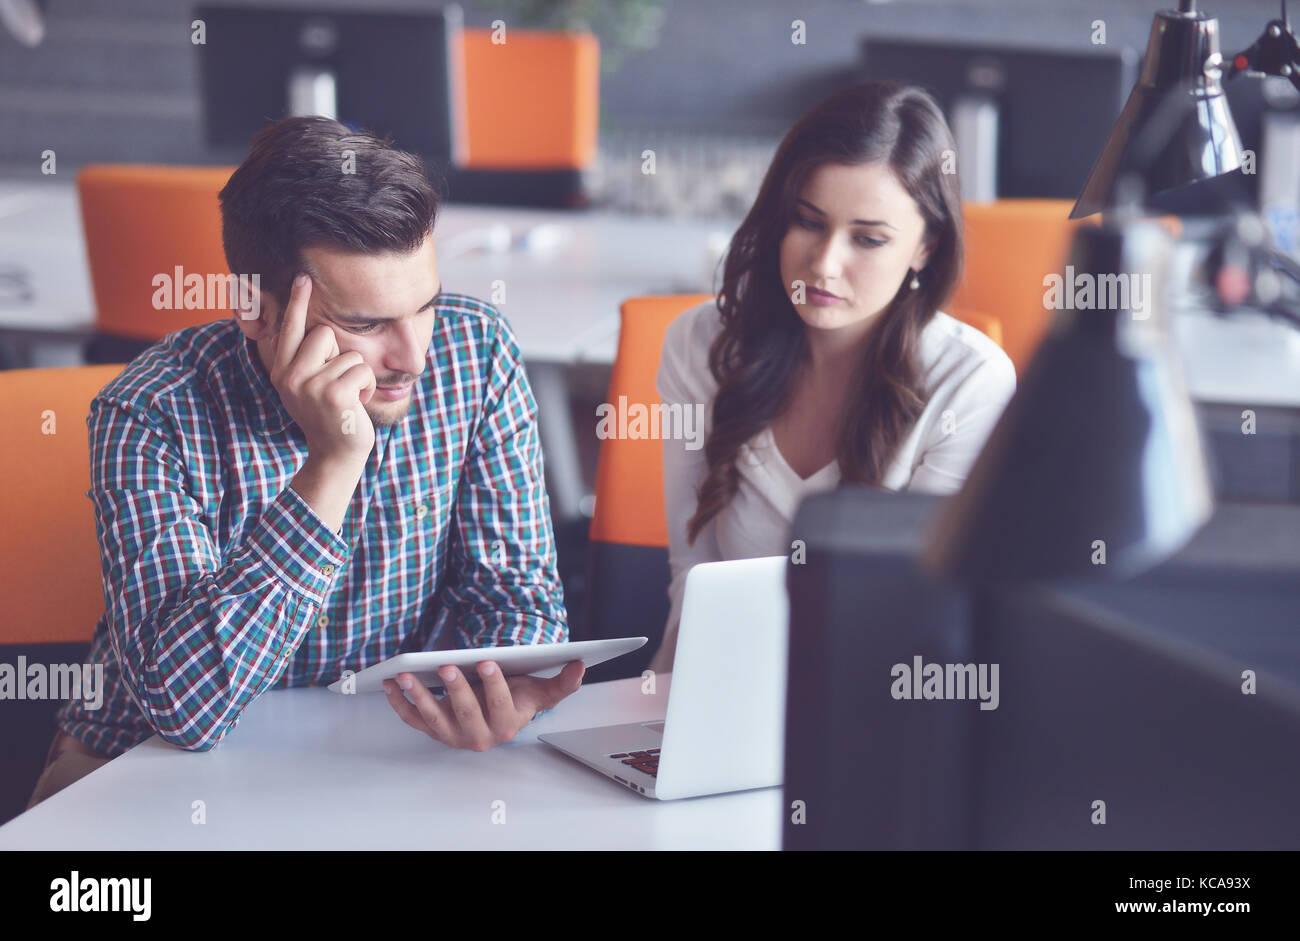 Junge casual business Paar mit Computer im Büro. Coworking, creative Manager zeigt neue startup Idee Stockbild